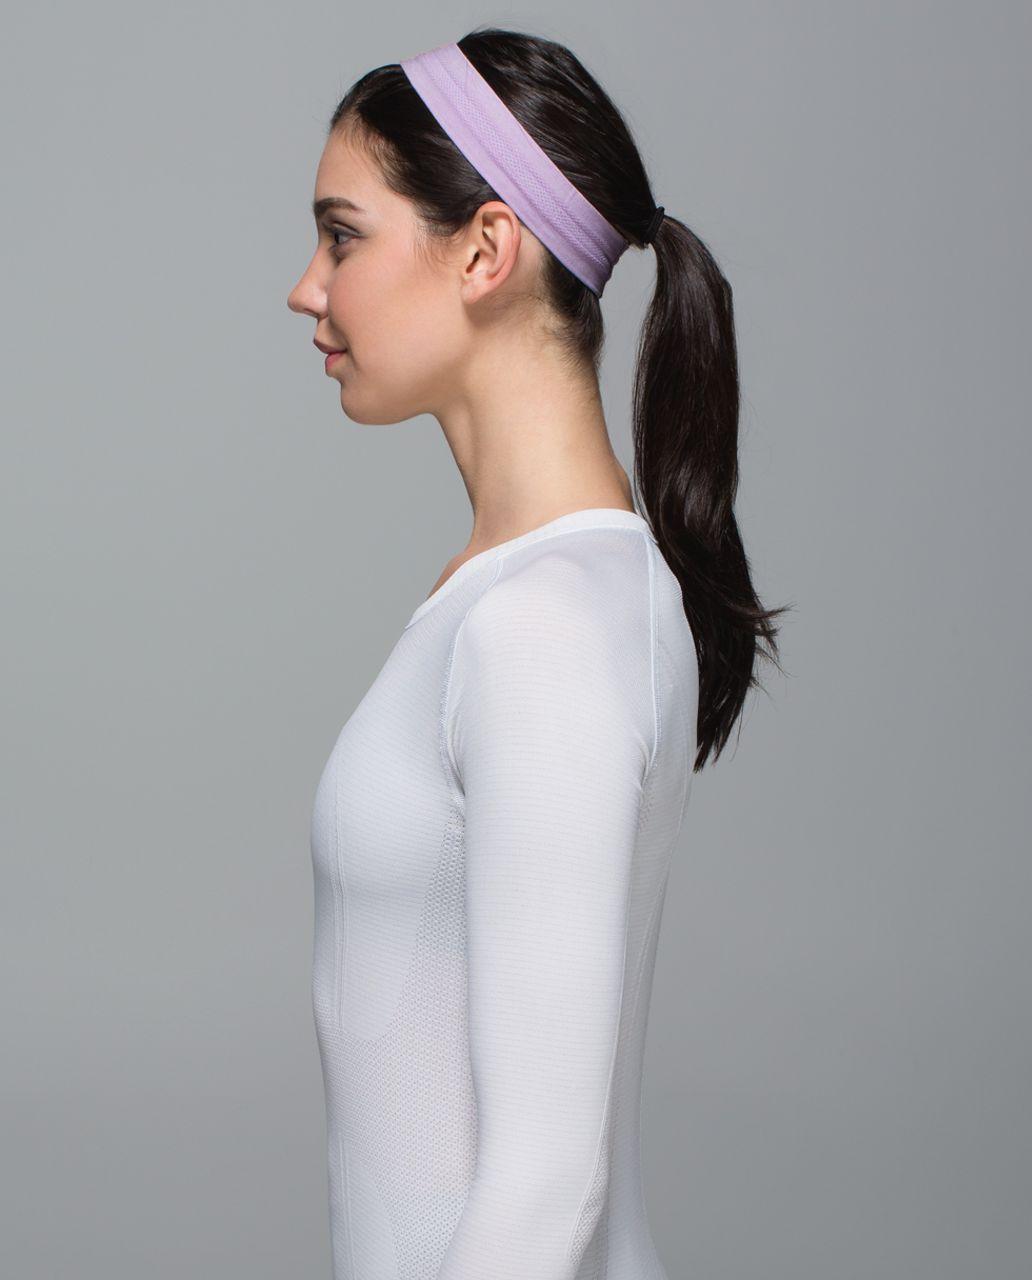 Lululemon Swiftly Headband - Space Dye Heathered Pretty Purple